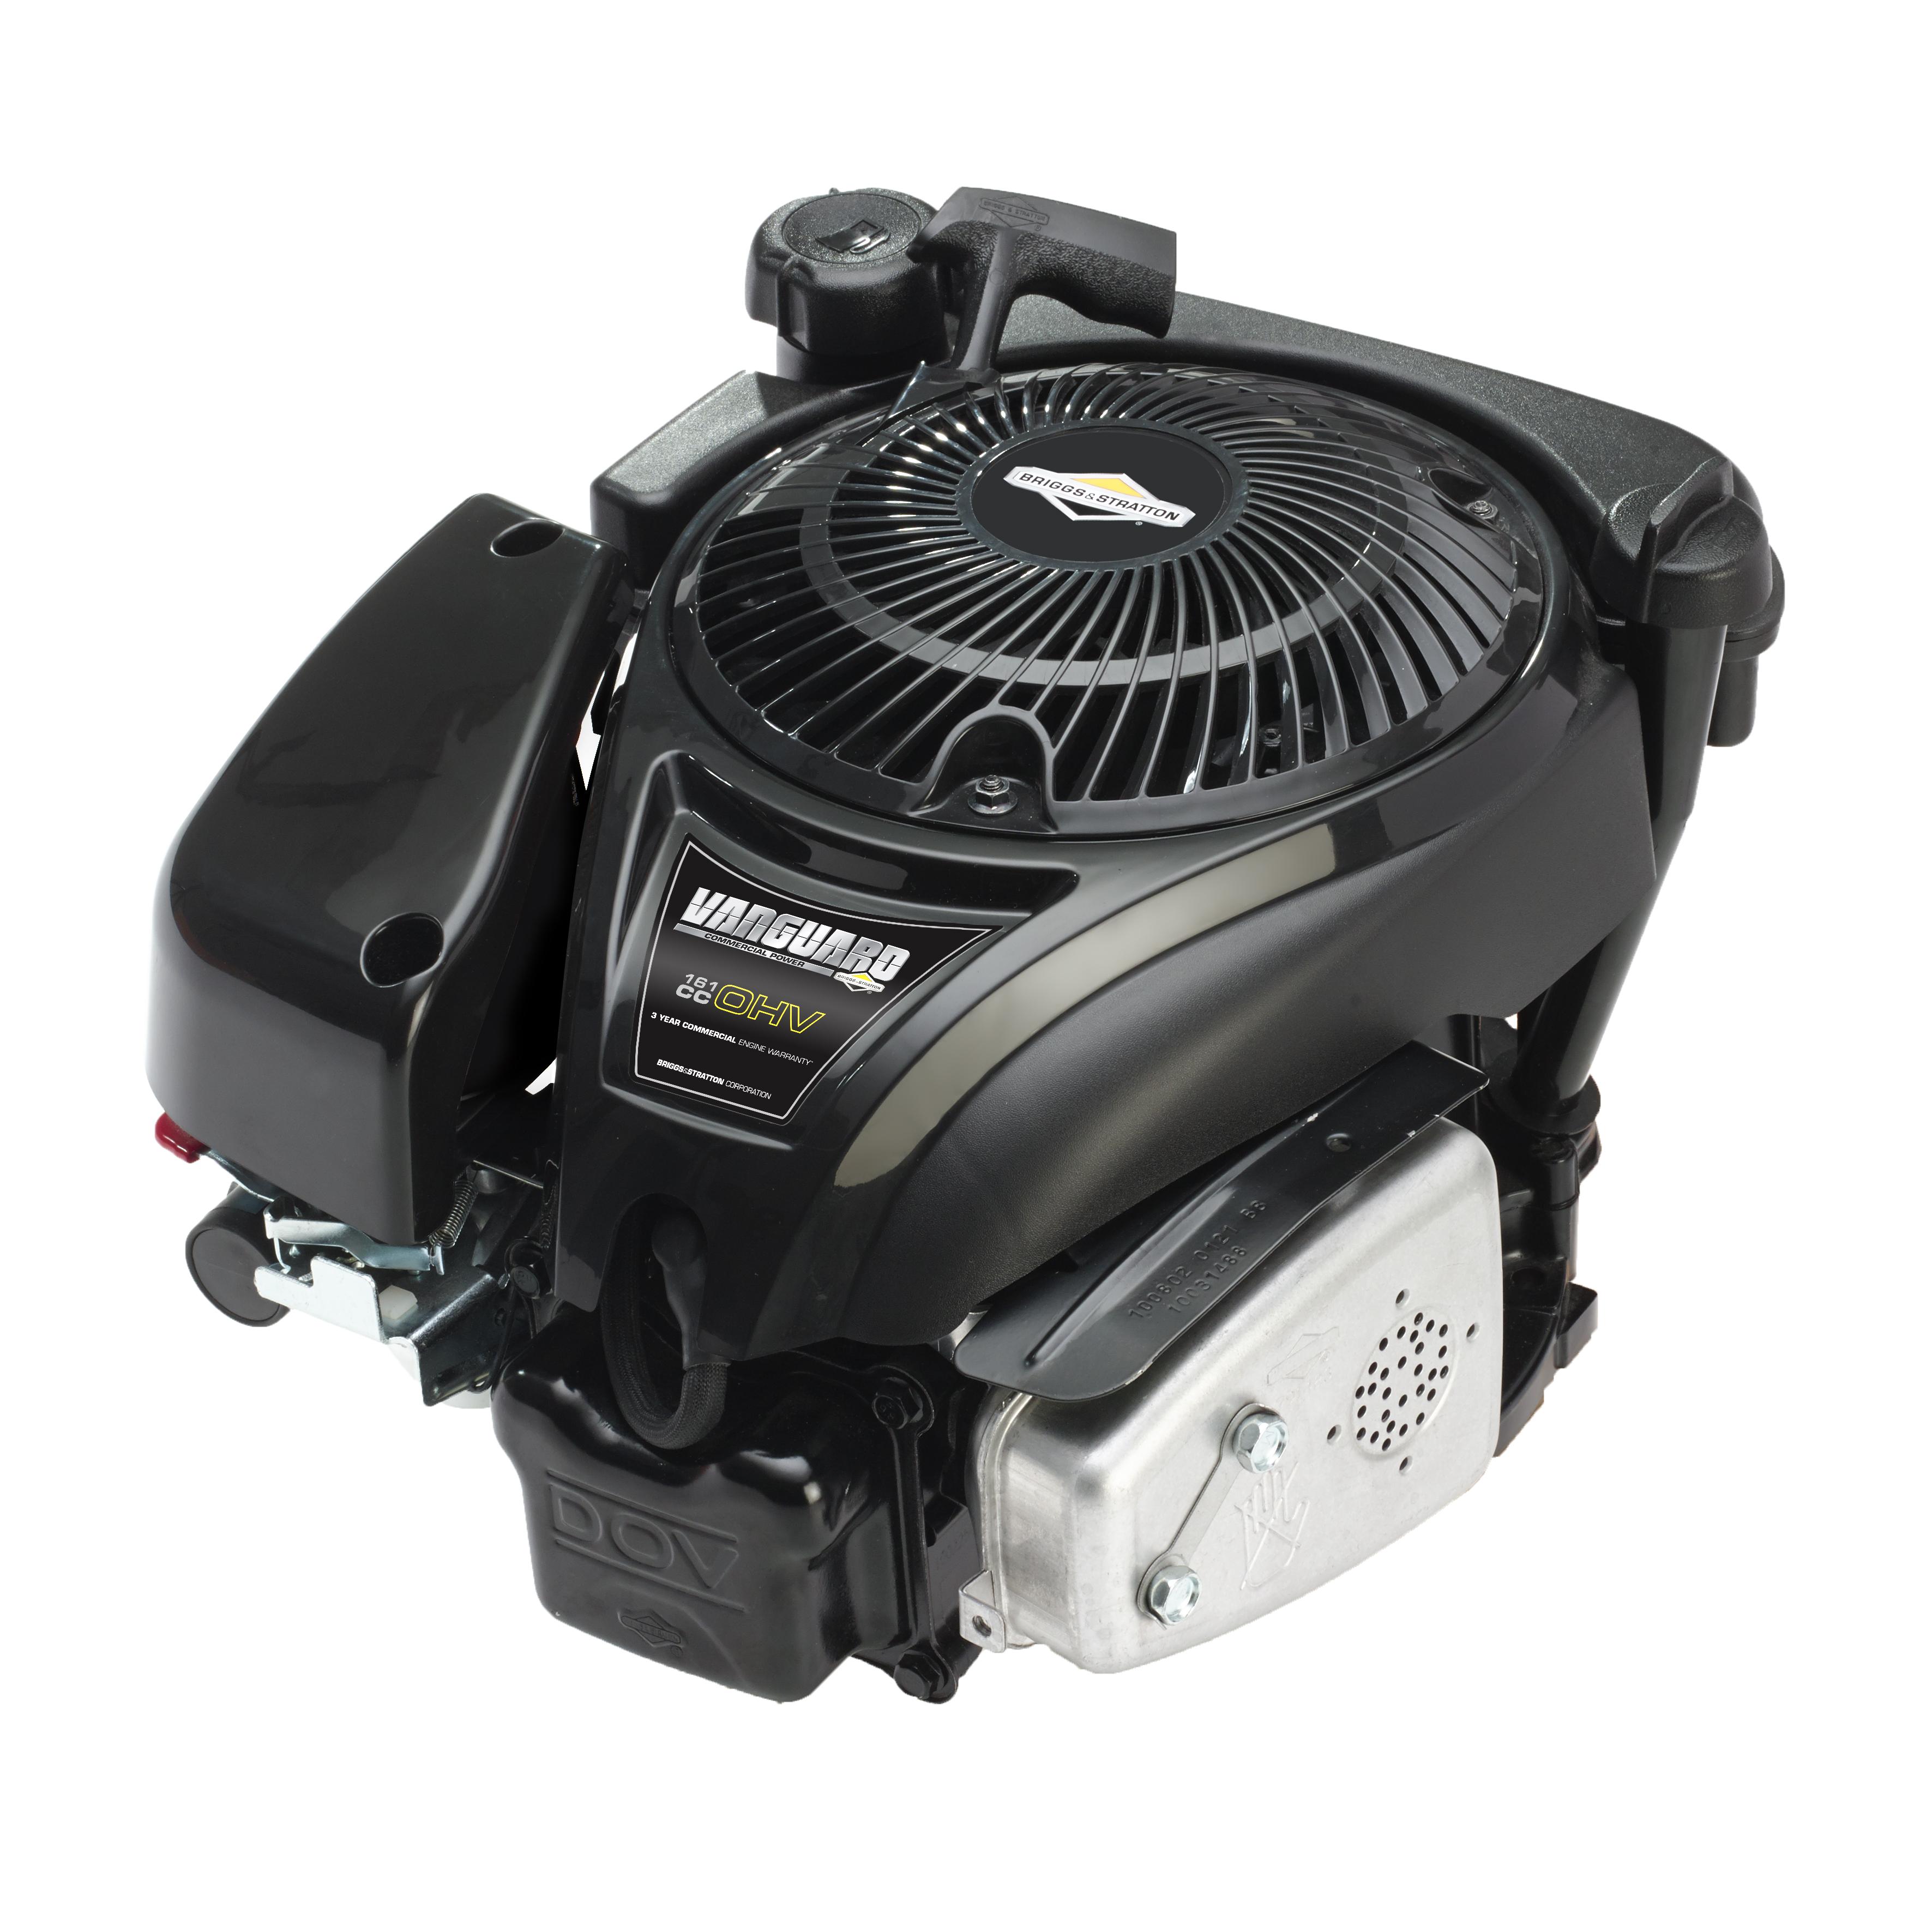 Vanguard™ 161cc